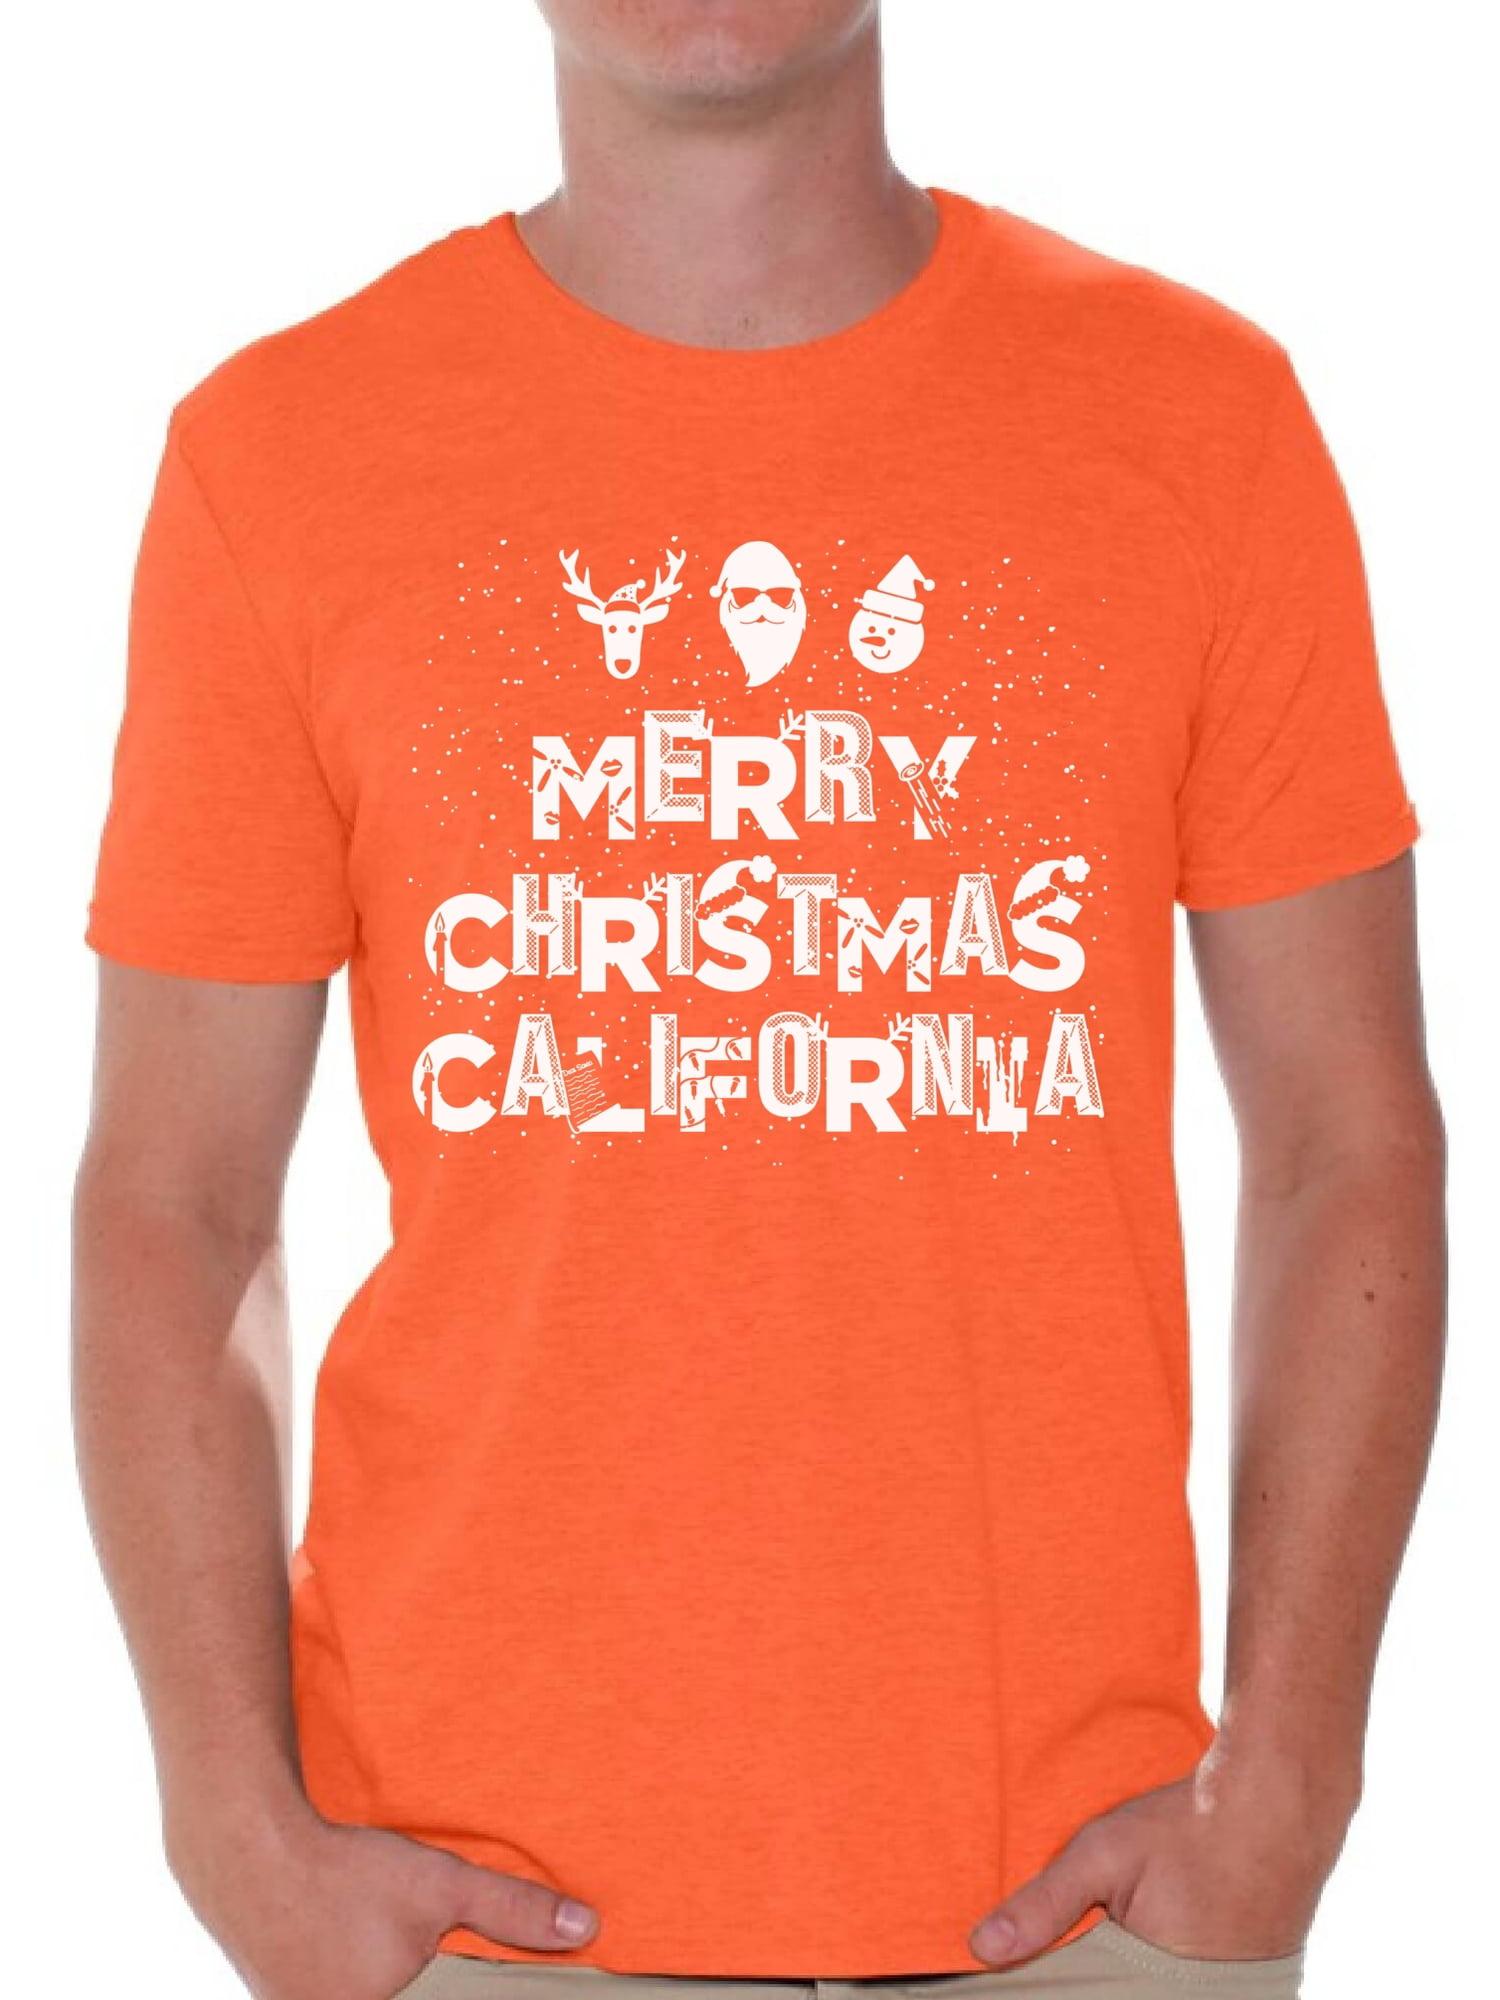 CALIFORNIA CALI CA PRINT T SHIRT FUNNY GRAPHIC SHIRTS COTTON TEE HUMOR GIFT